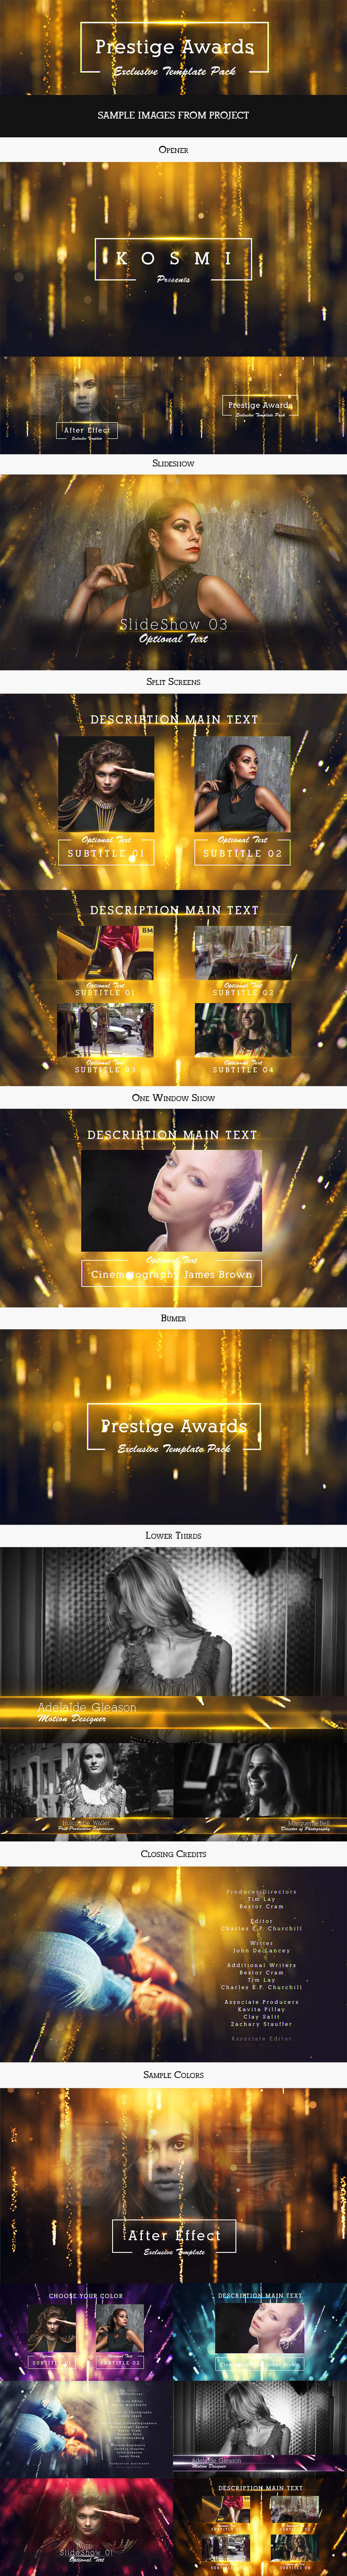 Ae模板 2019年会颁奖典礼提名奖项婚礼活动素材包 Prestige Awards